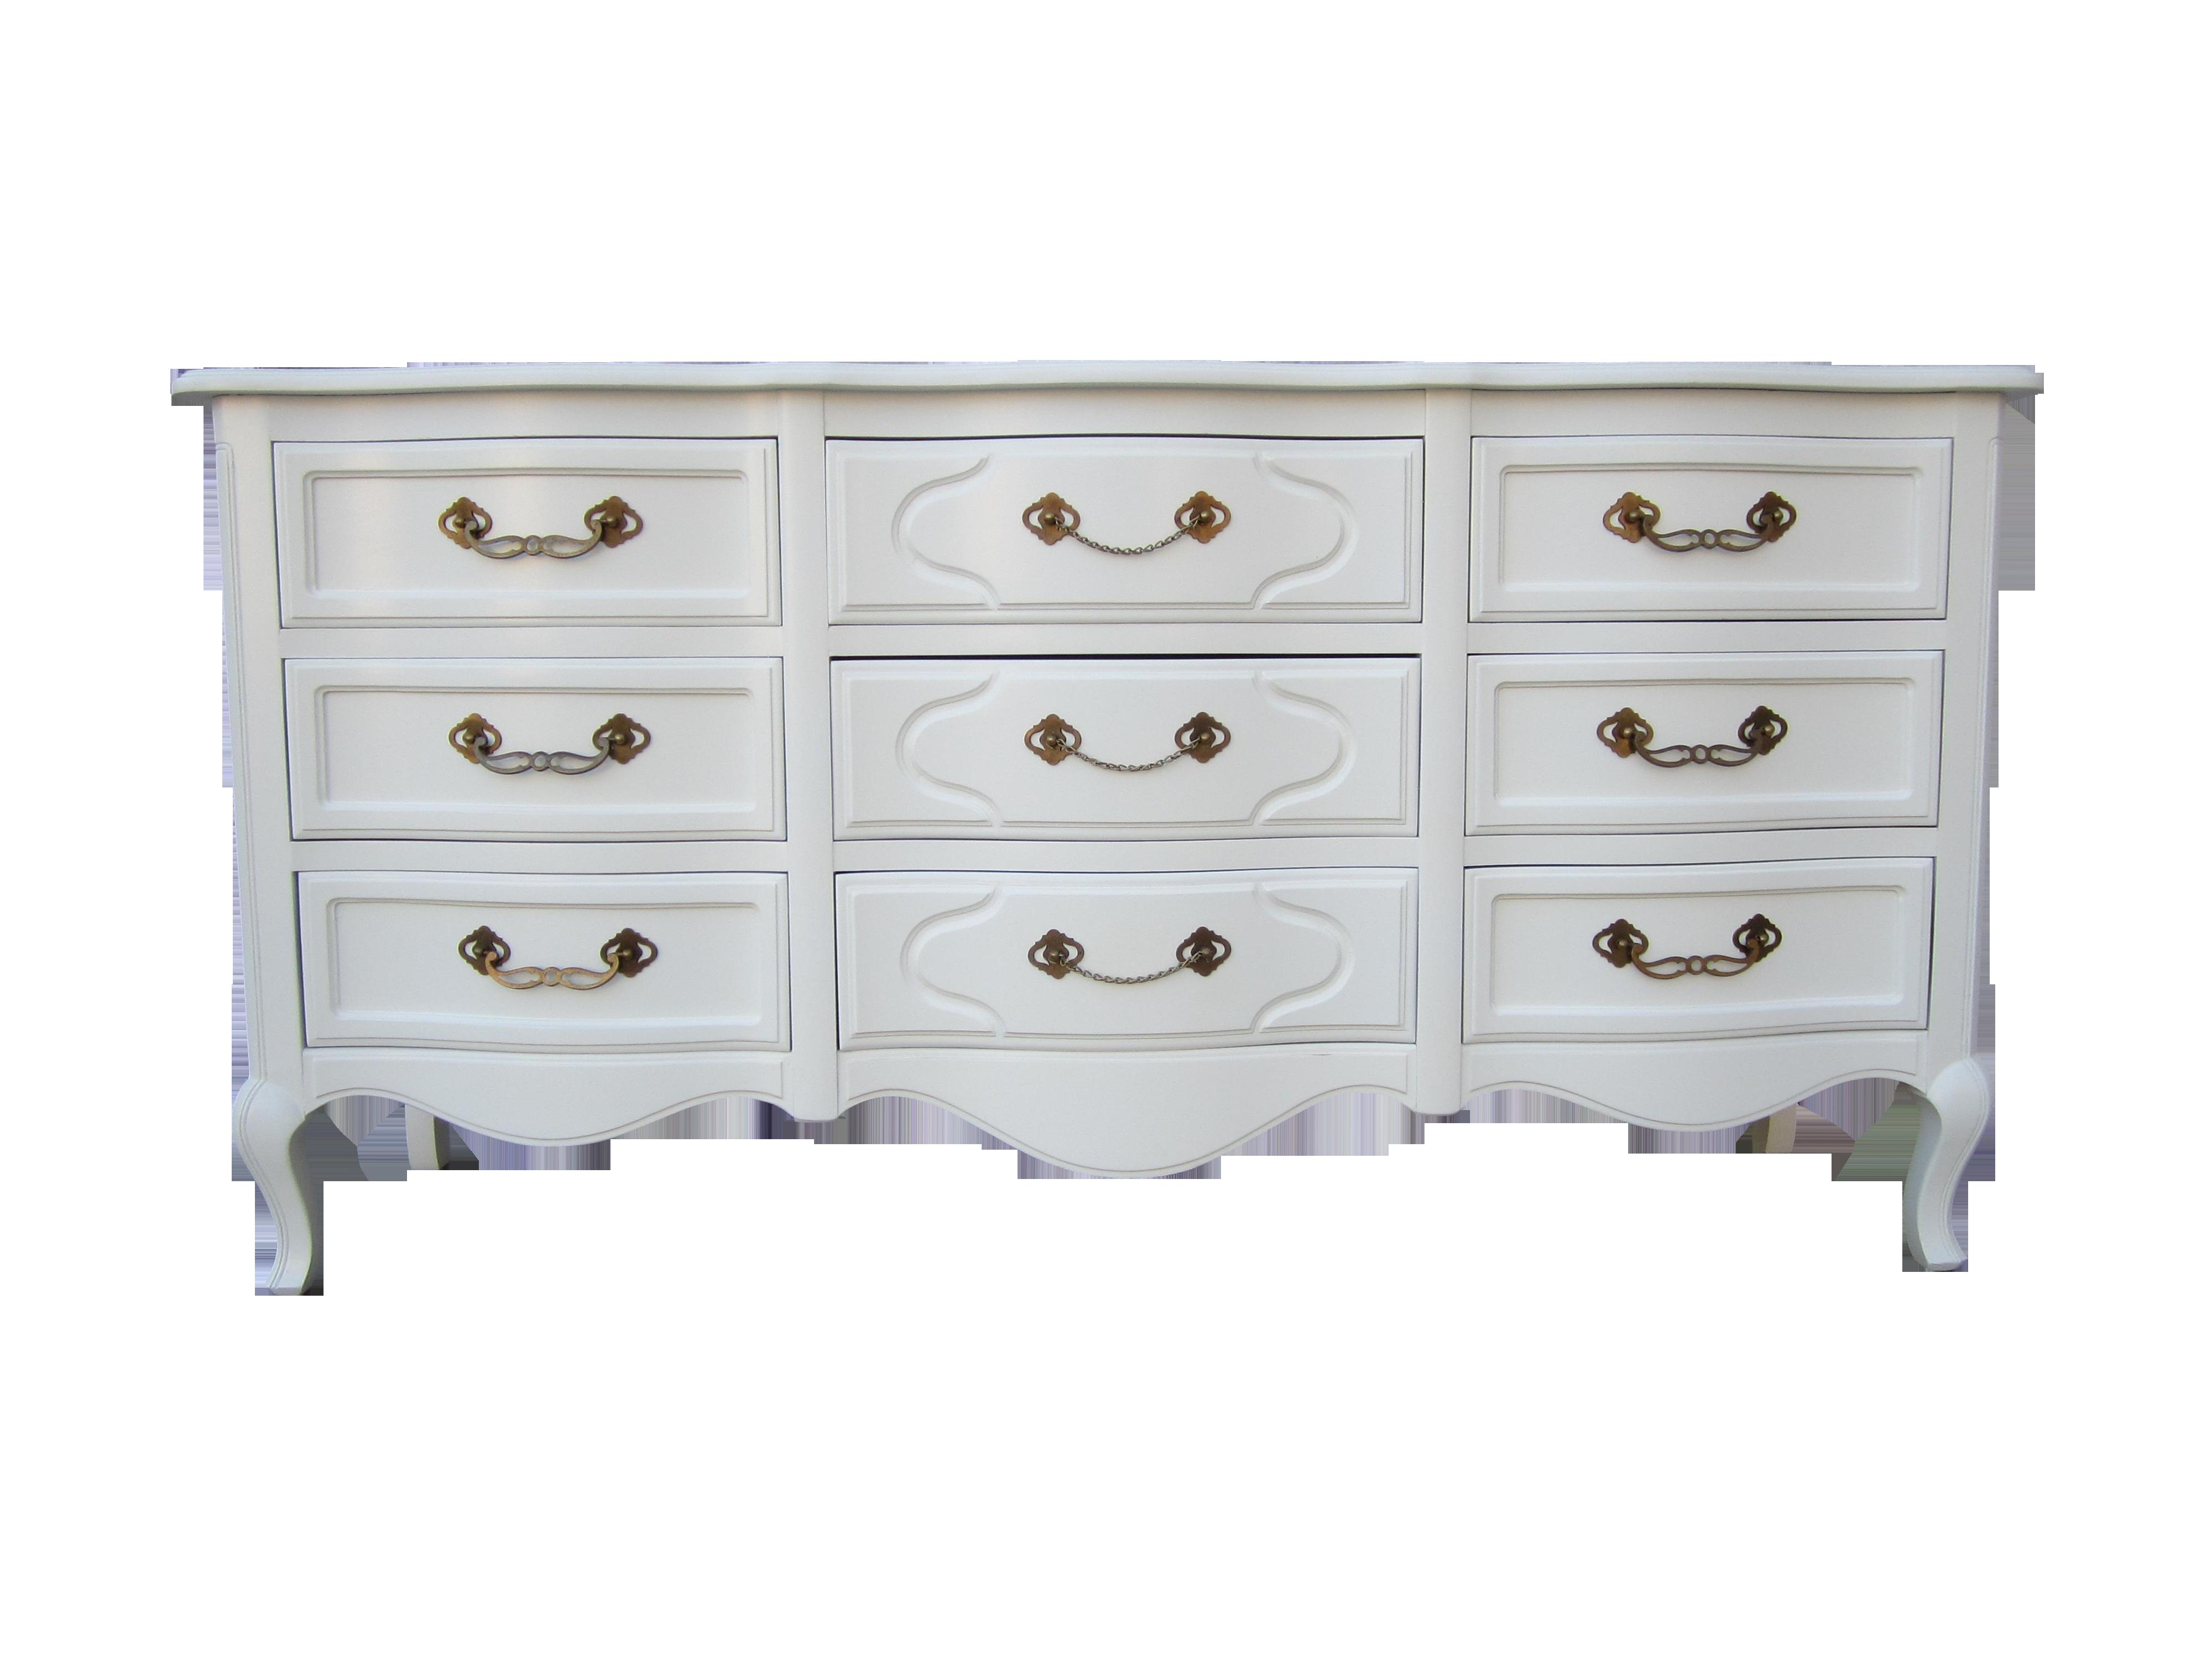 White Antique Dresser drexel white vintage french country dresser | chairish